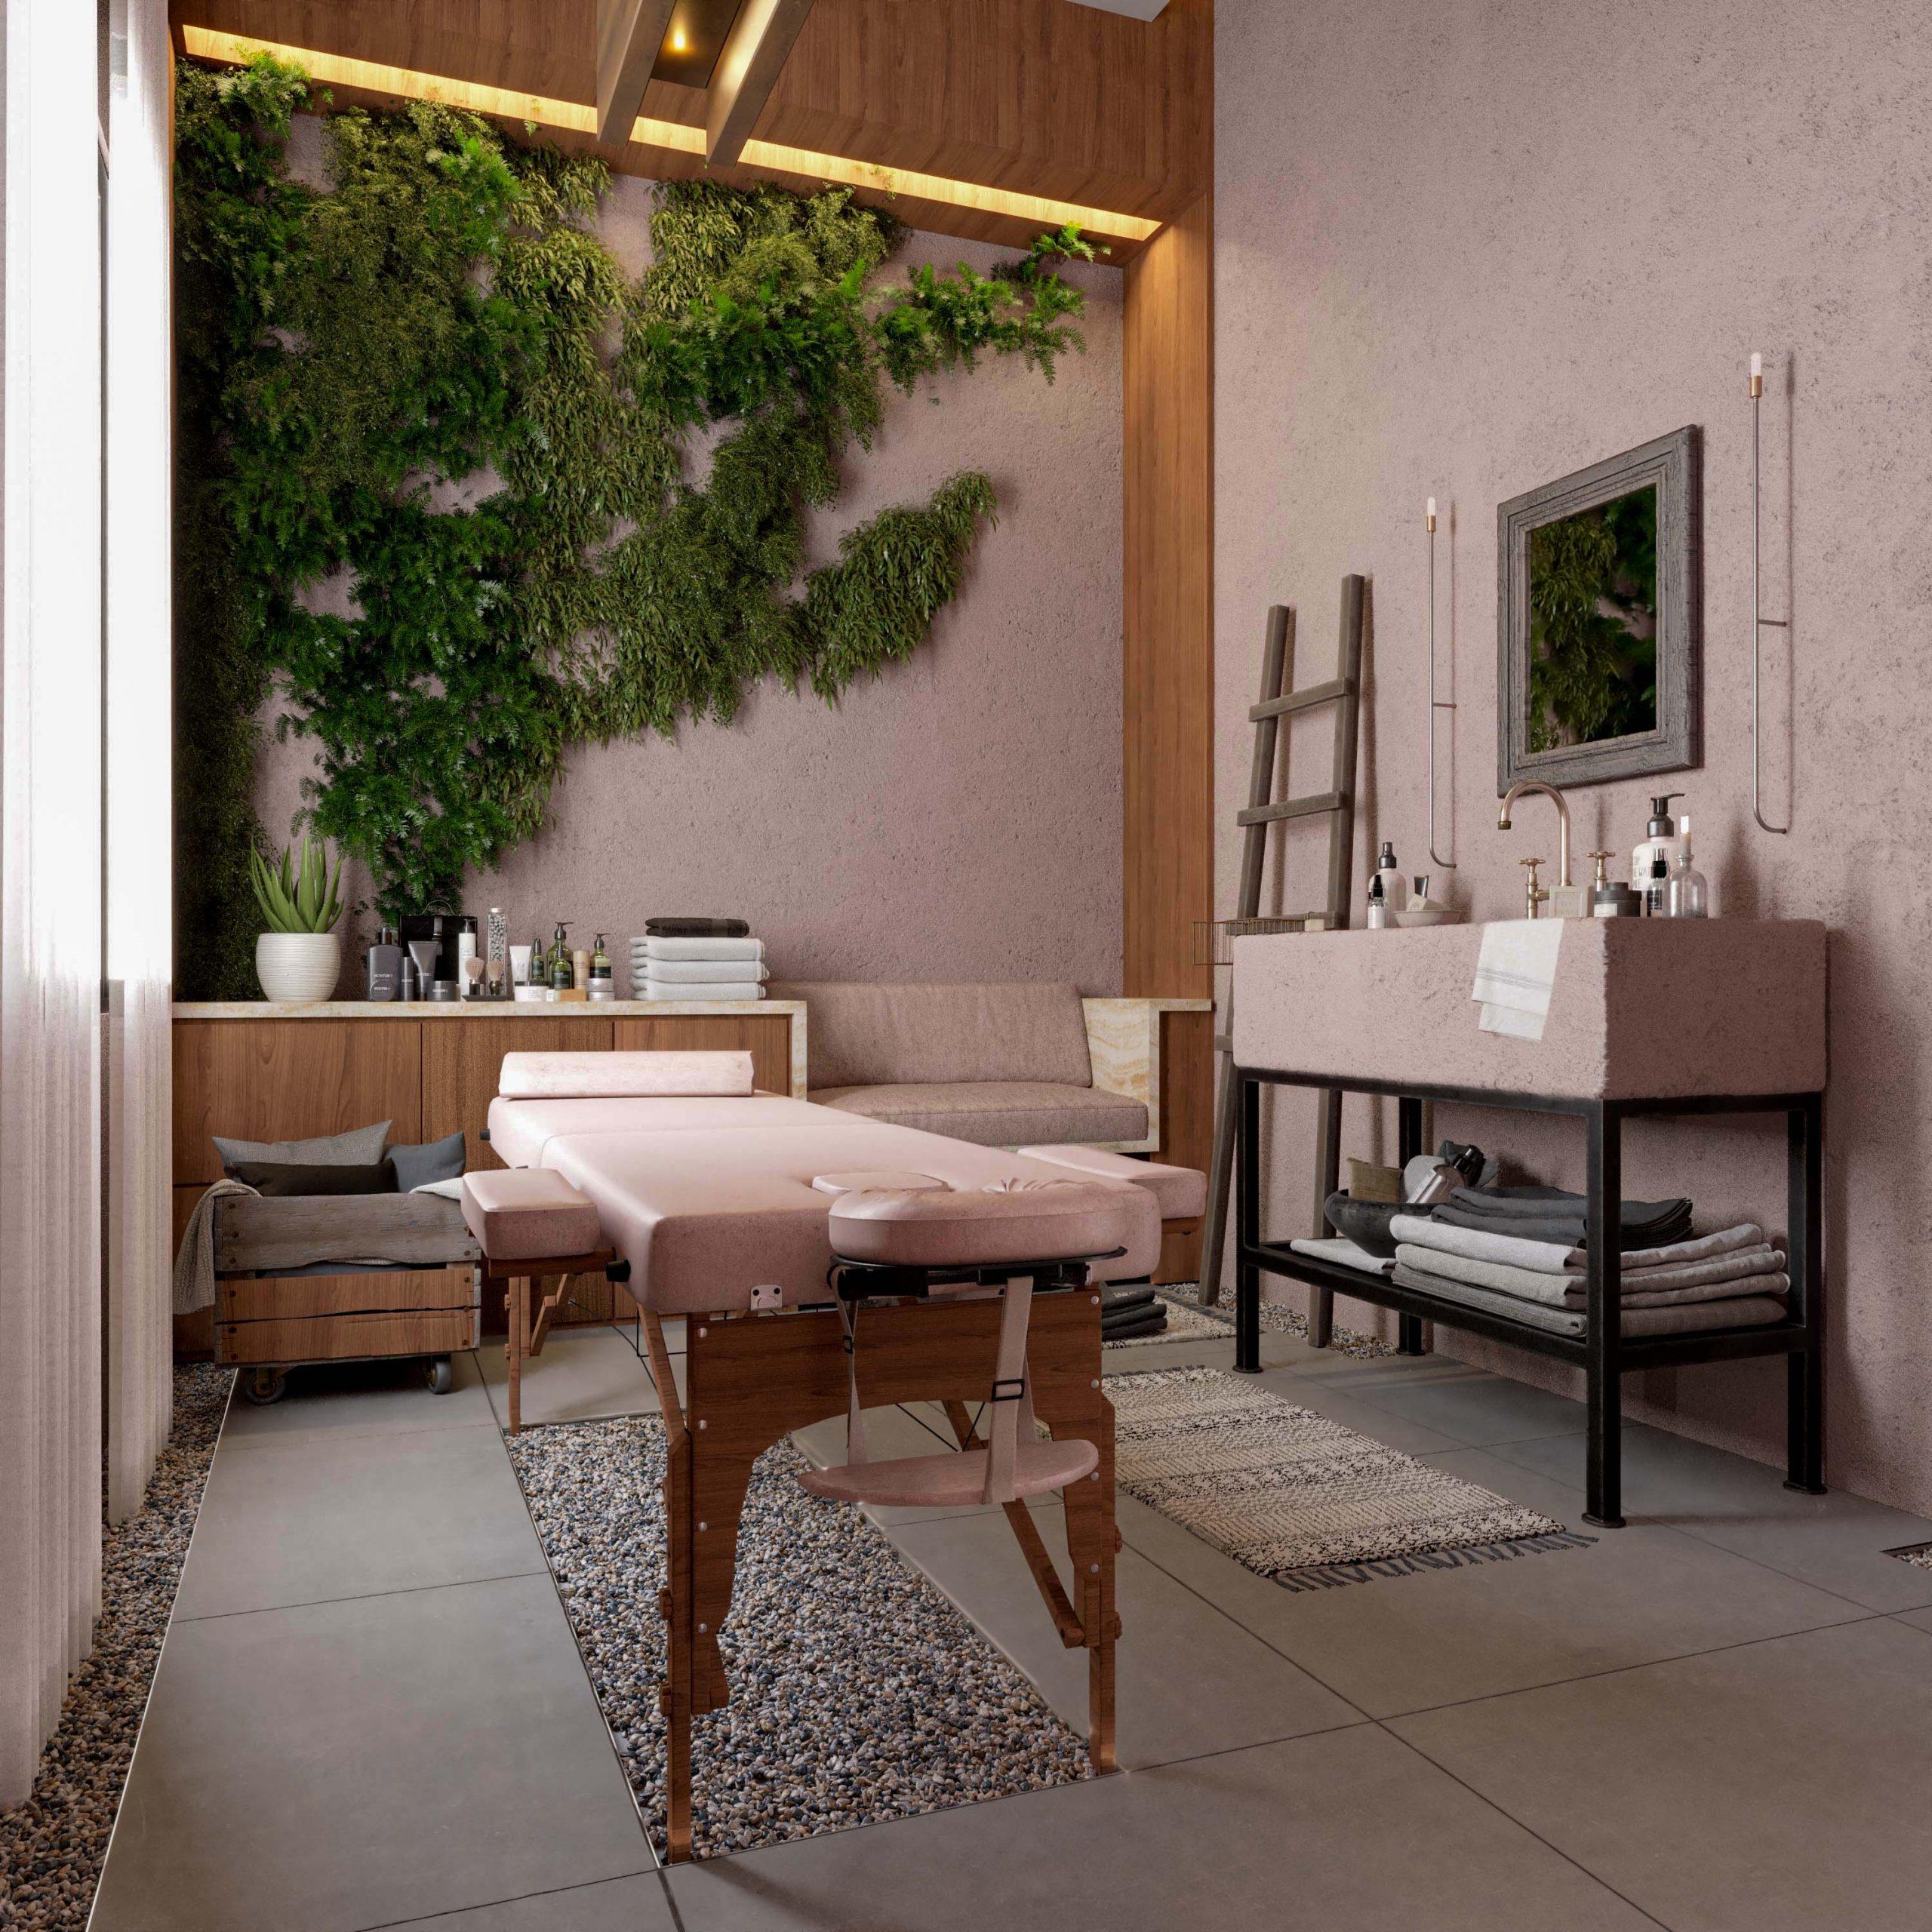 massage section - ocean spa design - spa